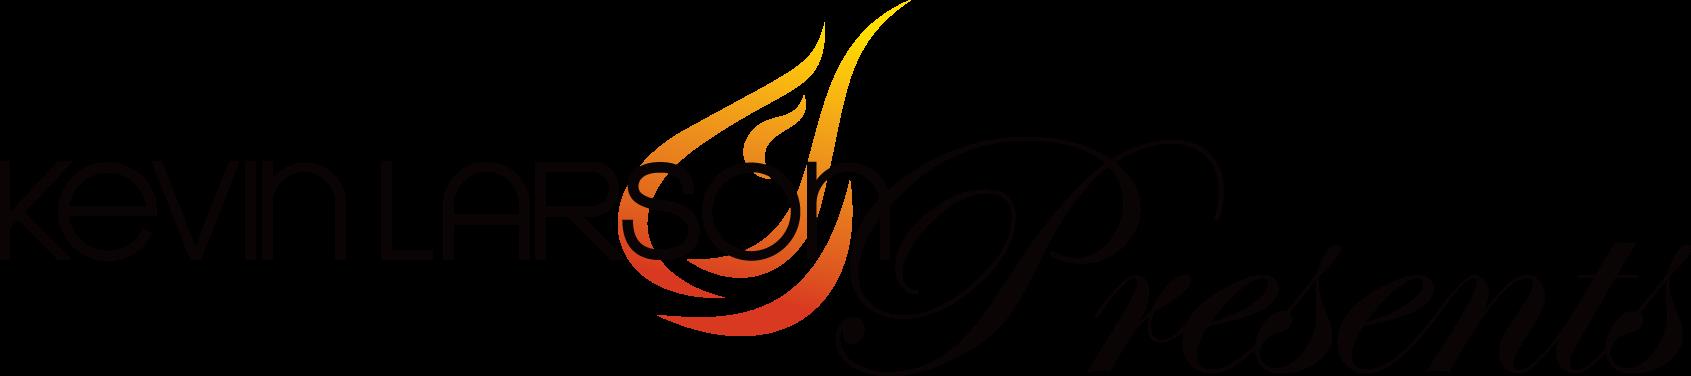 KLP_Logo_Black_4cFlame_111612